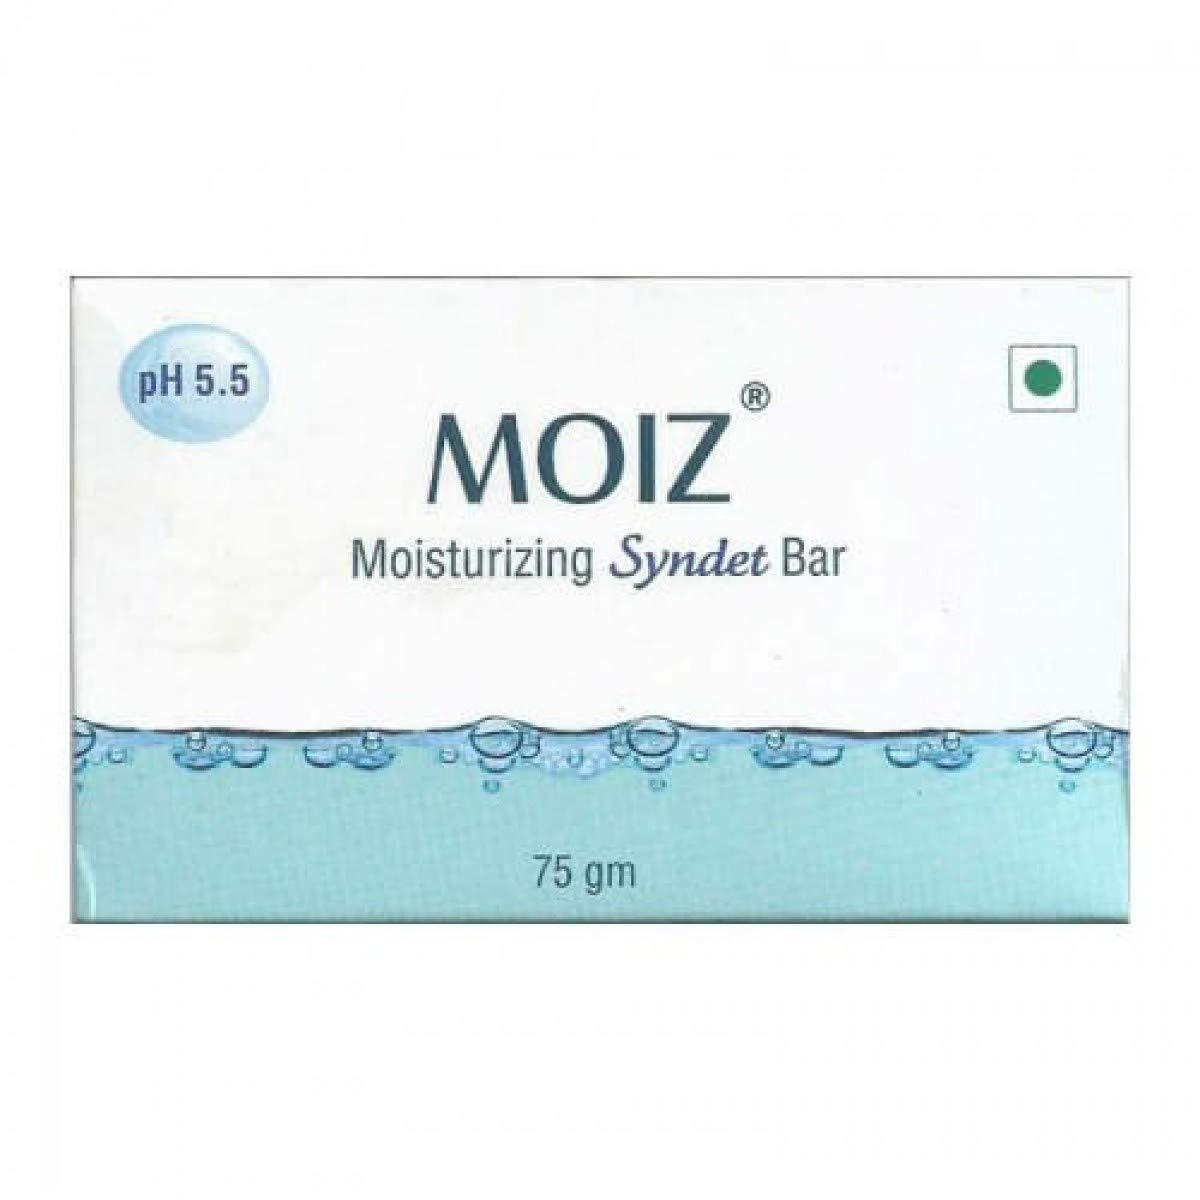 Moiz Moisturizing Syndet Bar 75gm